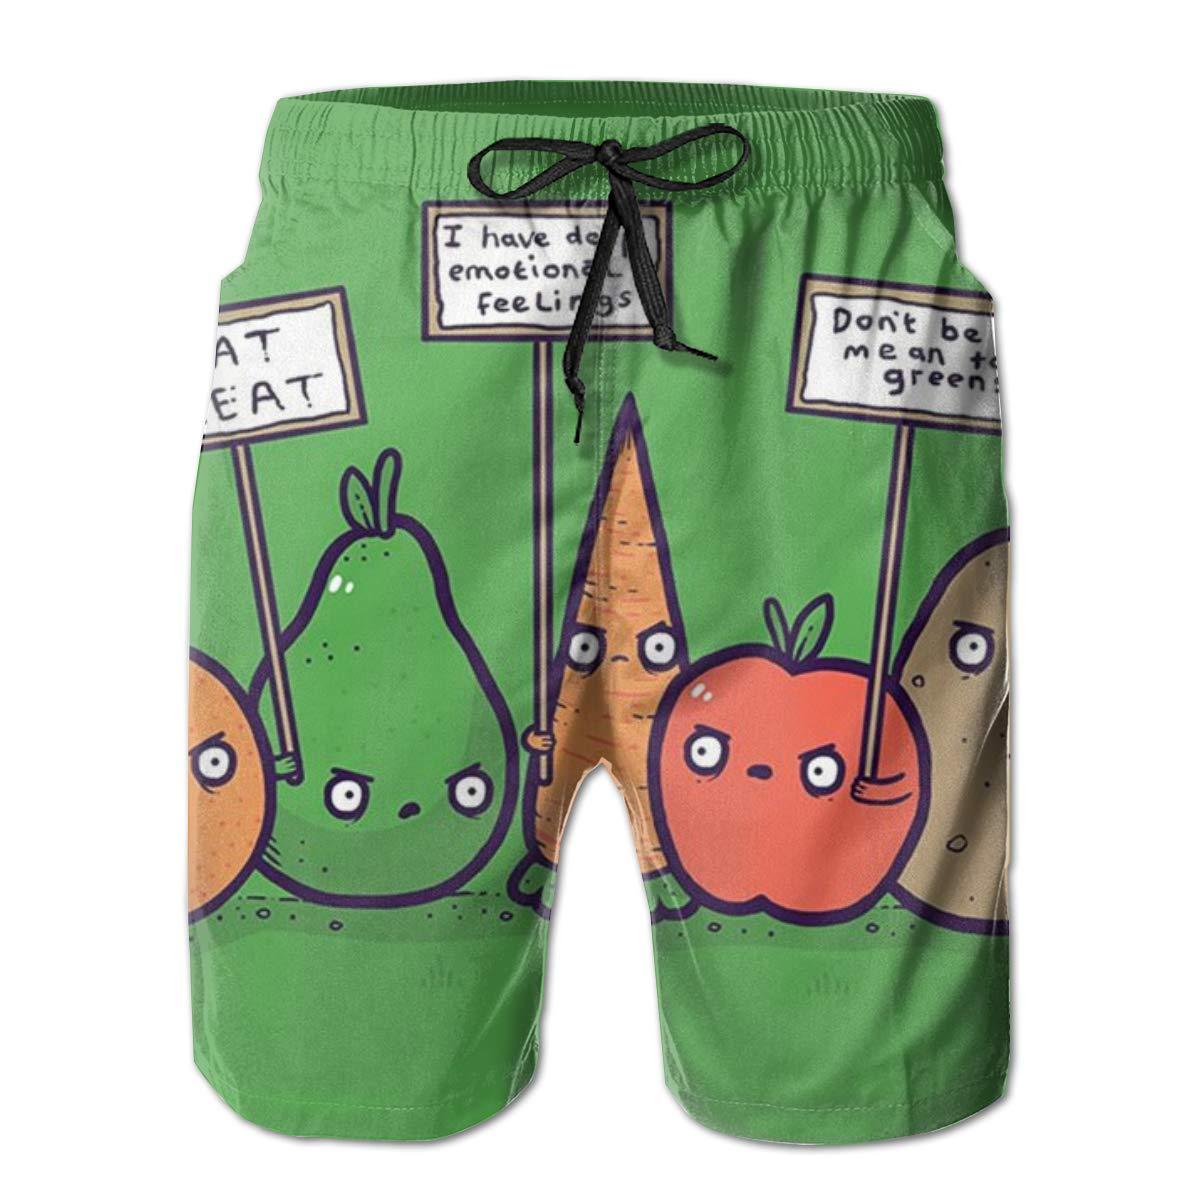 No Hard Feelings Mens Swim Trunks Quick Dry Holiday Beach Short Casual Board Shorts